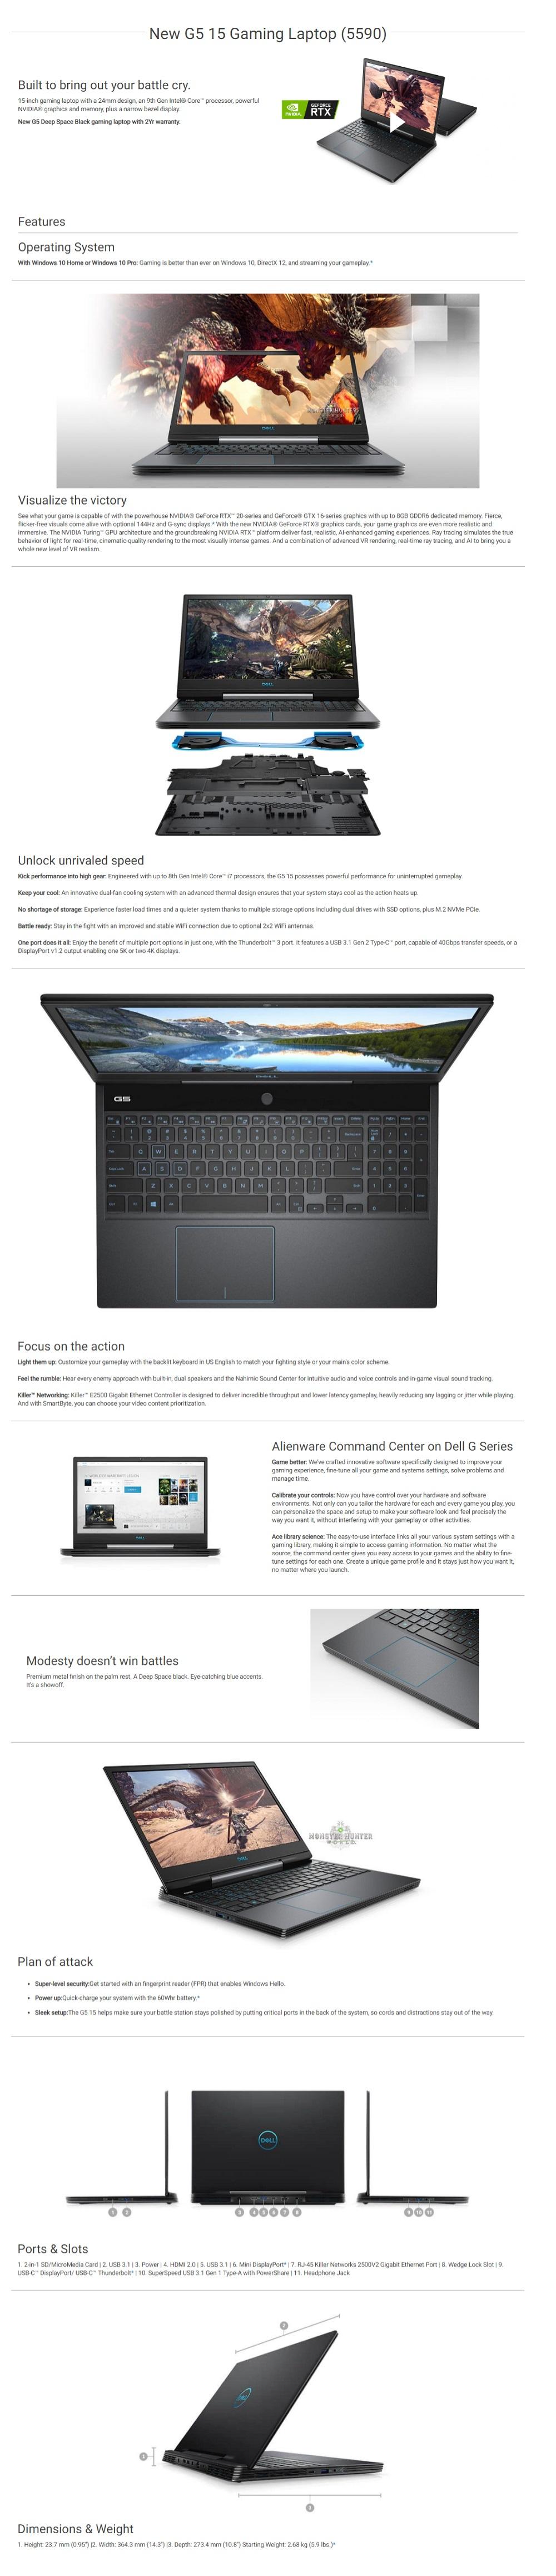 Ph Co Pc Depot Dell Gaming G5 5590 15 6 Intel Core I7 Laptop G597816g2060ssd